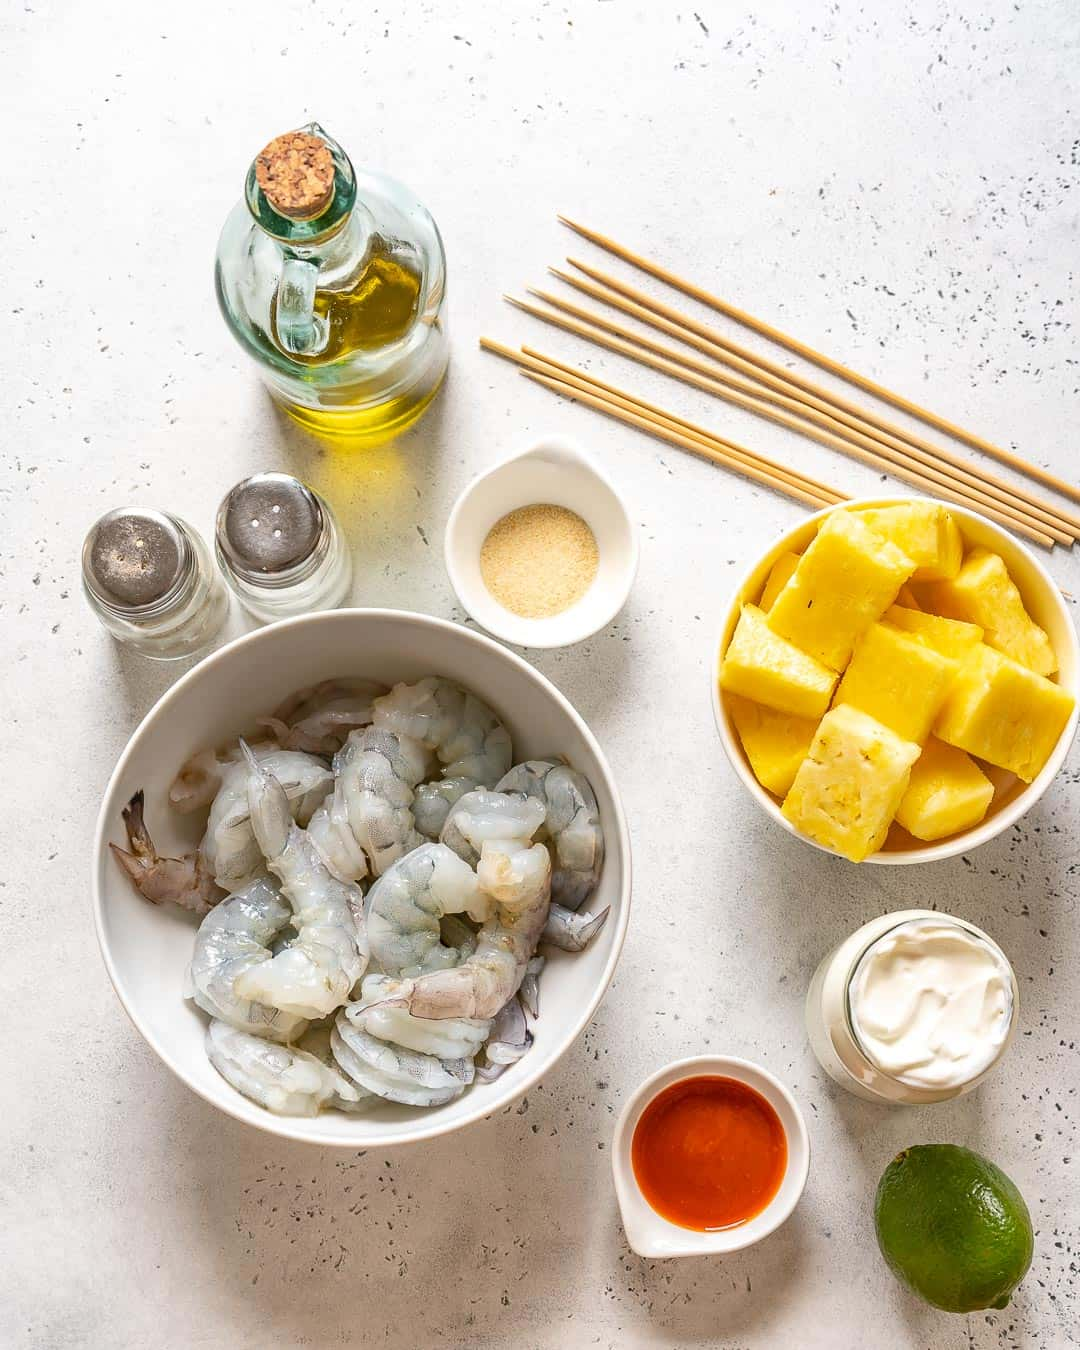 ingredients for Grilled Pineapple Shrimp Skewers